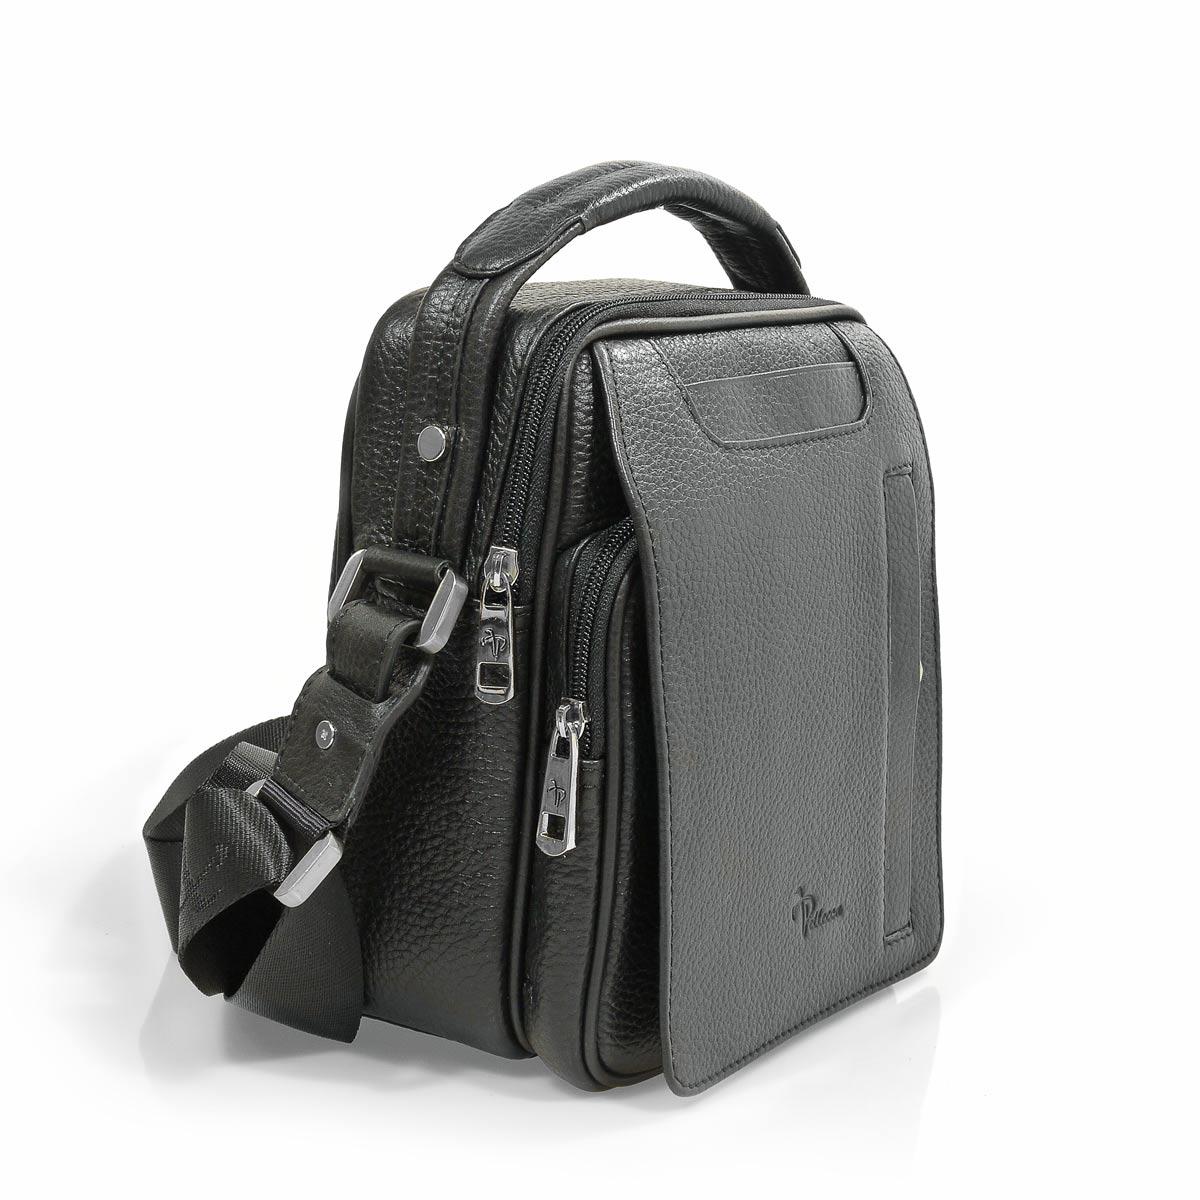 102-800-1 Men's Bag Pellekon